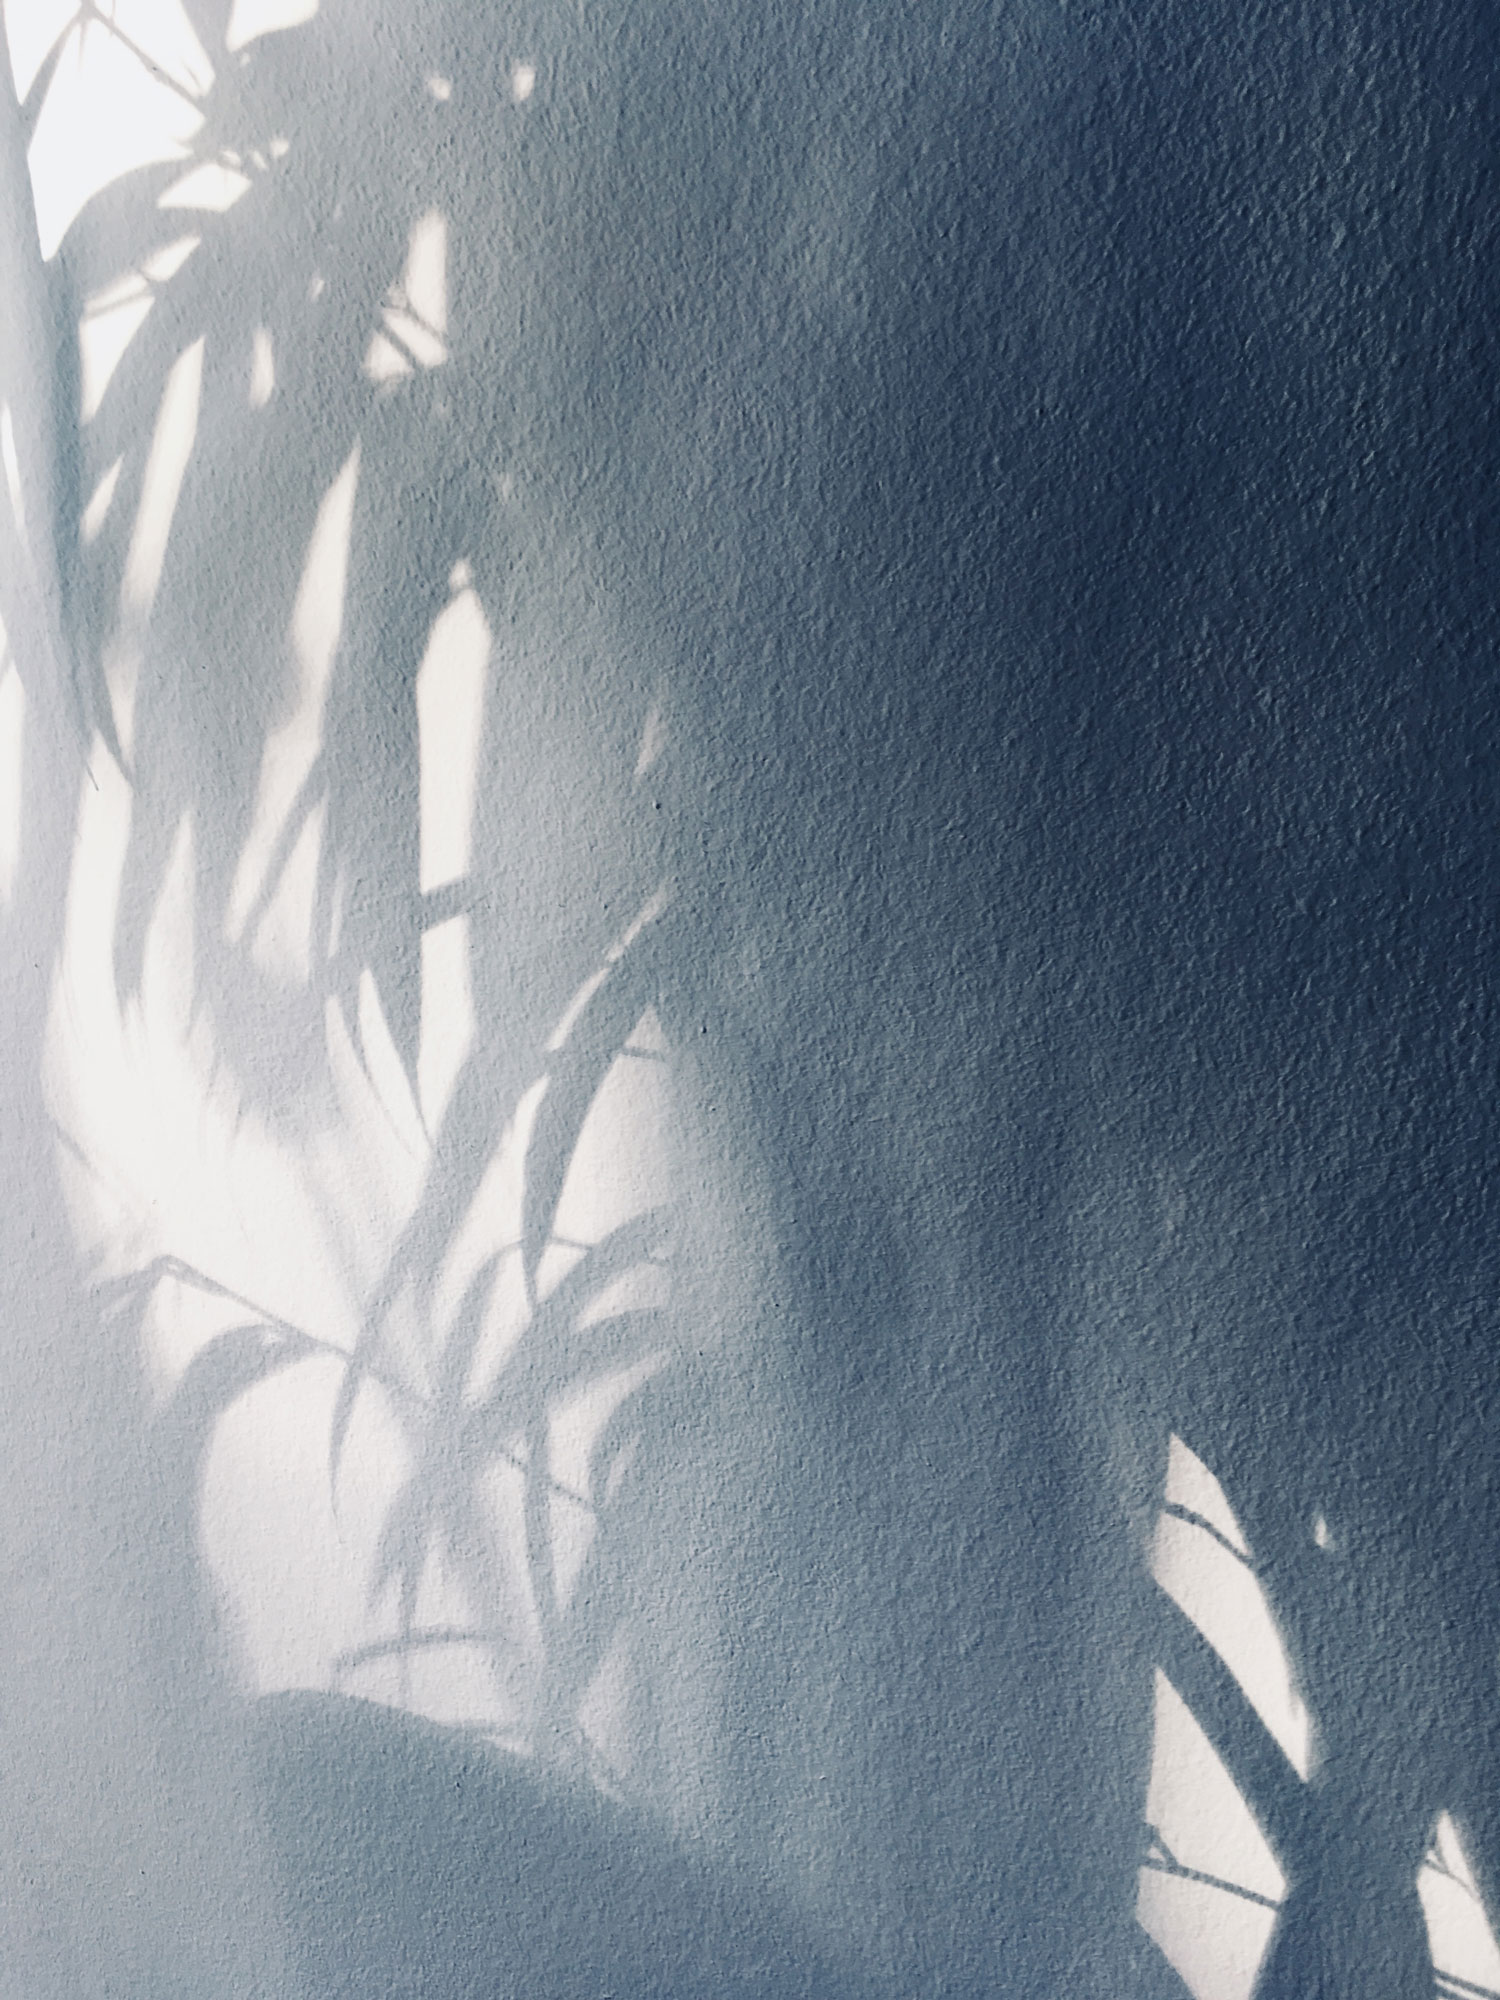 nadine bieg palm shadowplay wait for summer